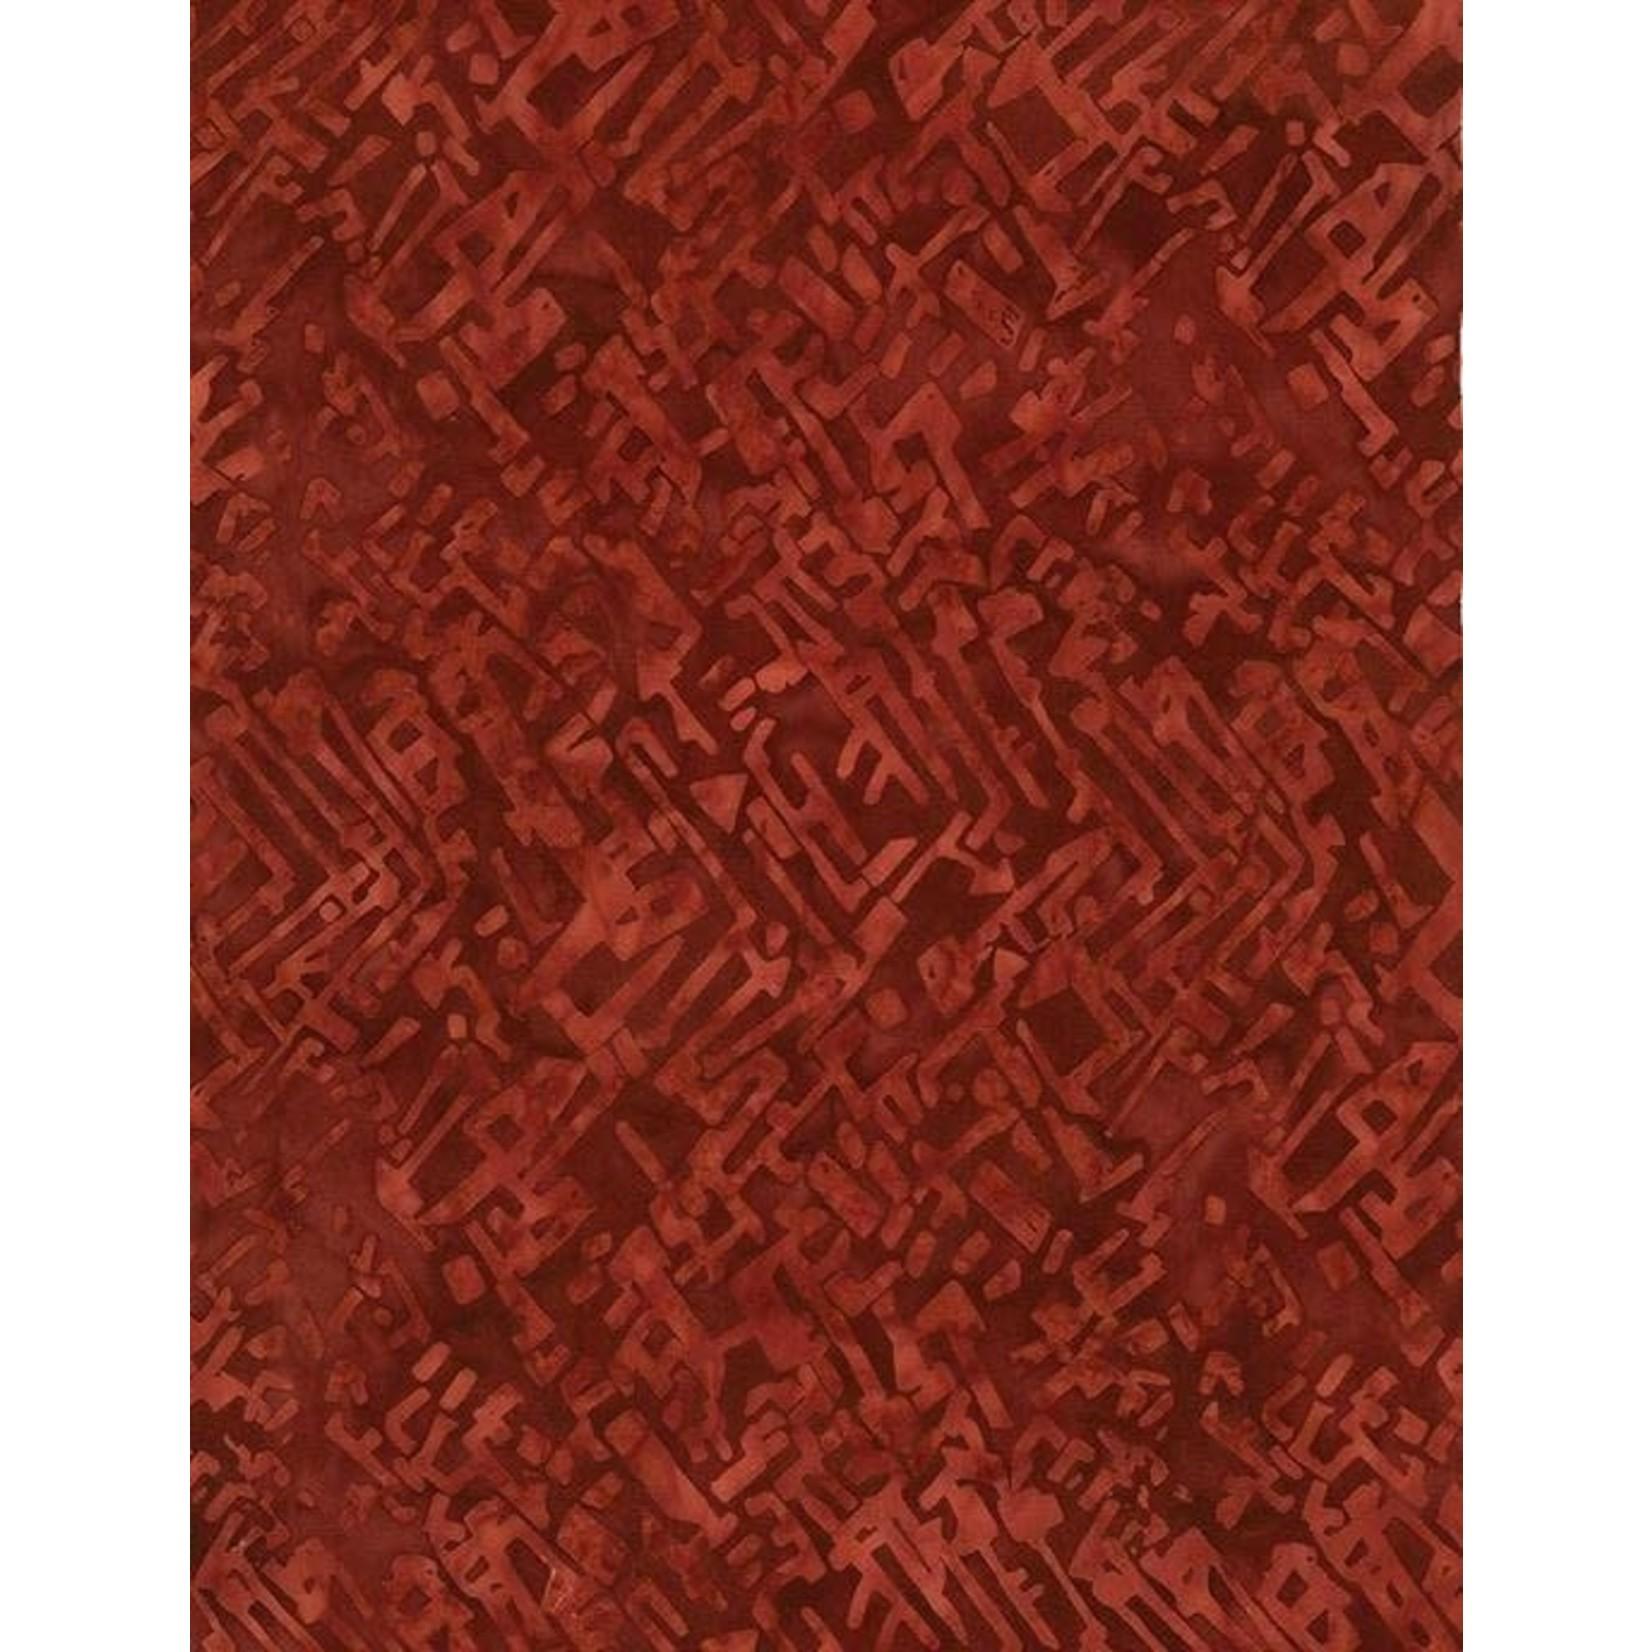 Tonga TONGA UNITED, LIBERTY (B6358) - PER CM OR $18/M BATIK